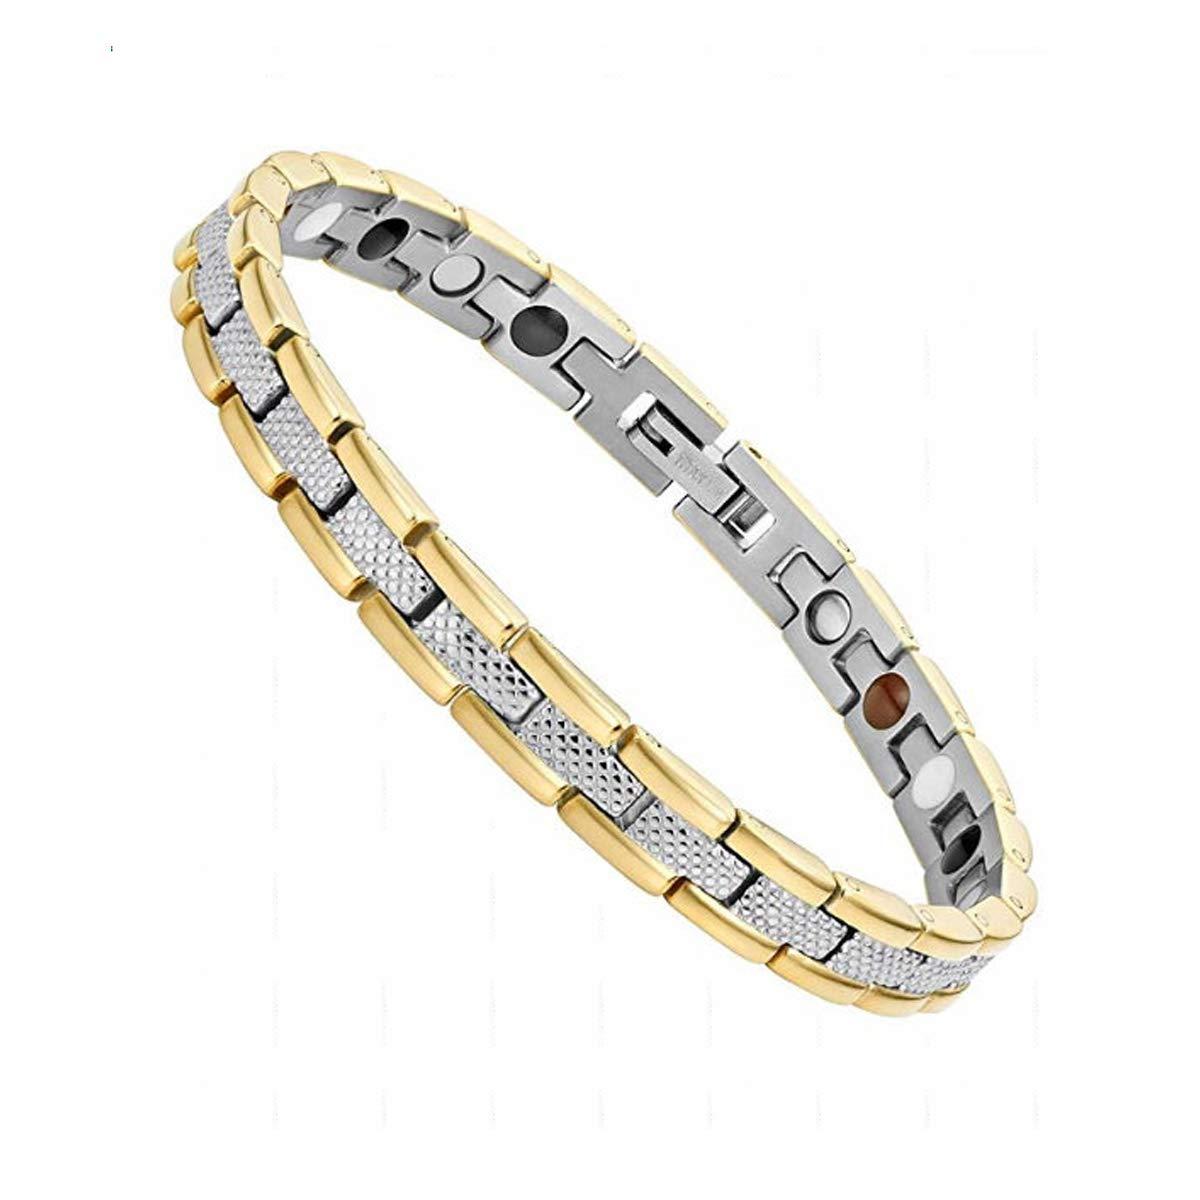 Vinca Mascot Ladies Elegant Magnetic Bracelet for Women Arthritis Pain Relief Perfect Health, Gold Silver